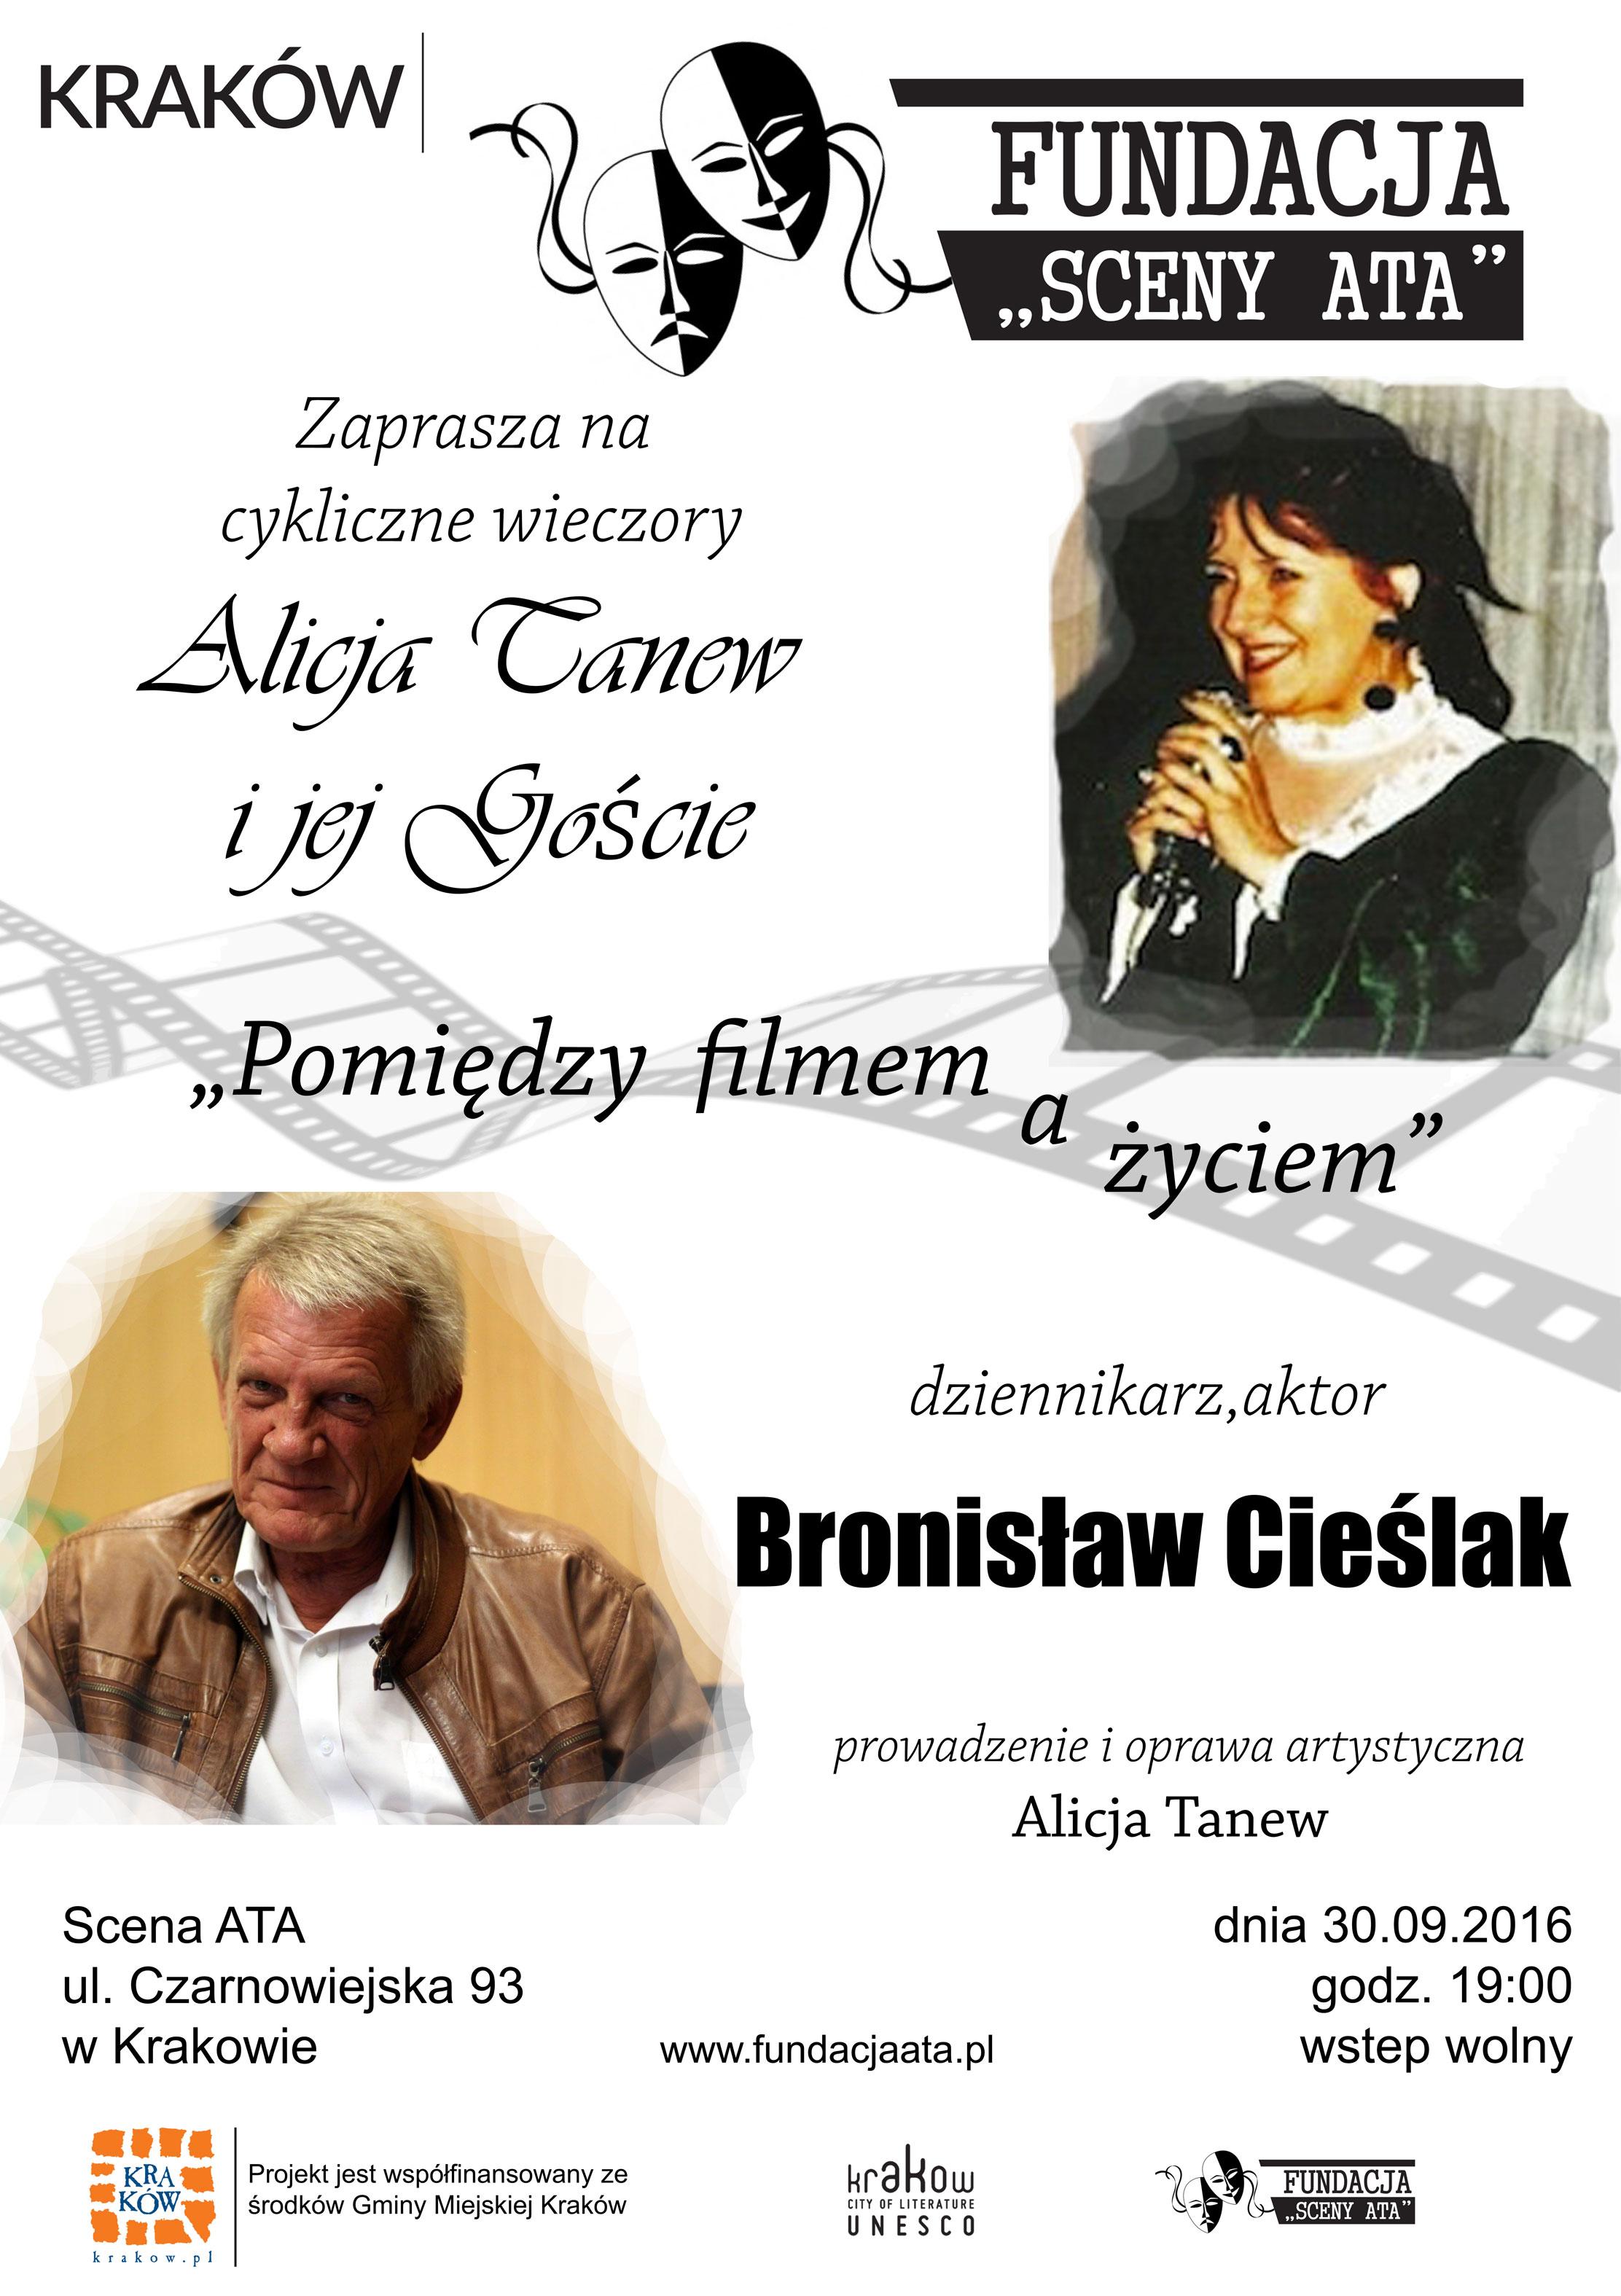 bronisław-Cieślak-PODGLĄD